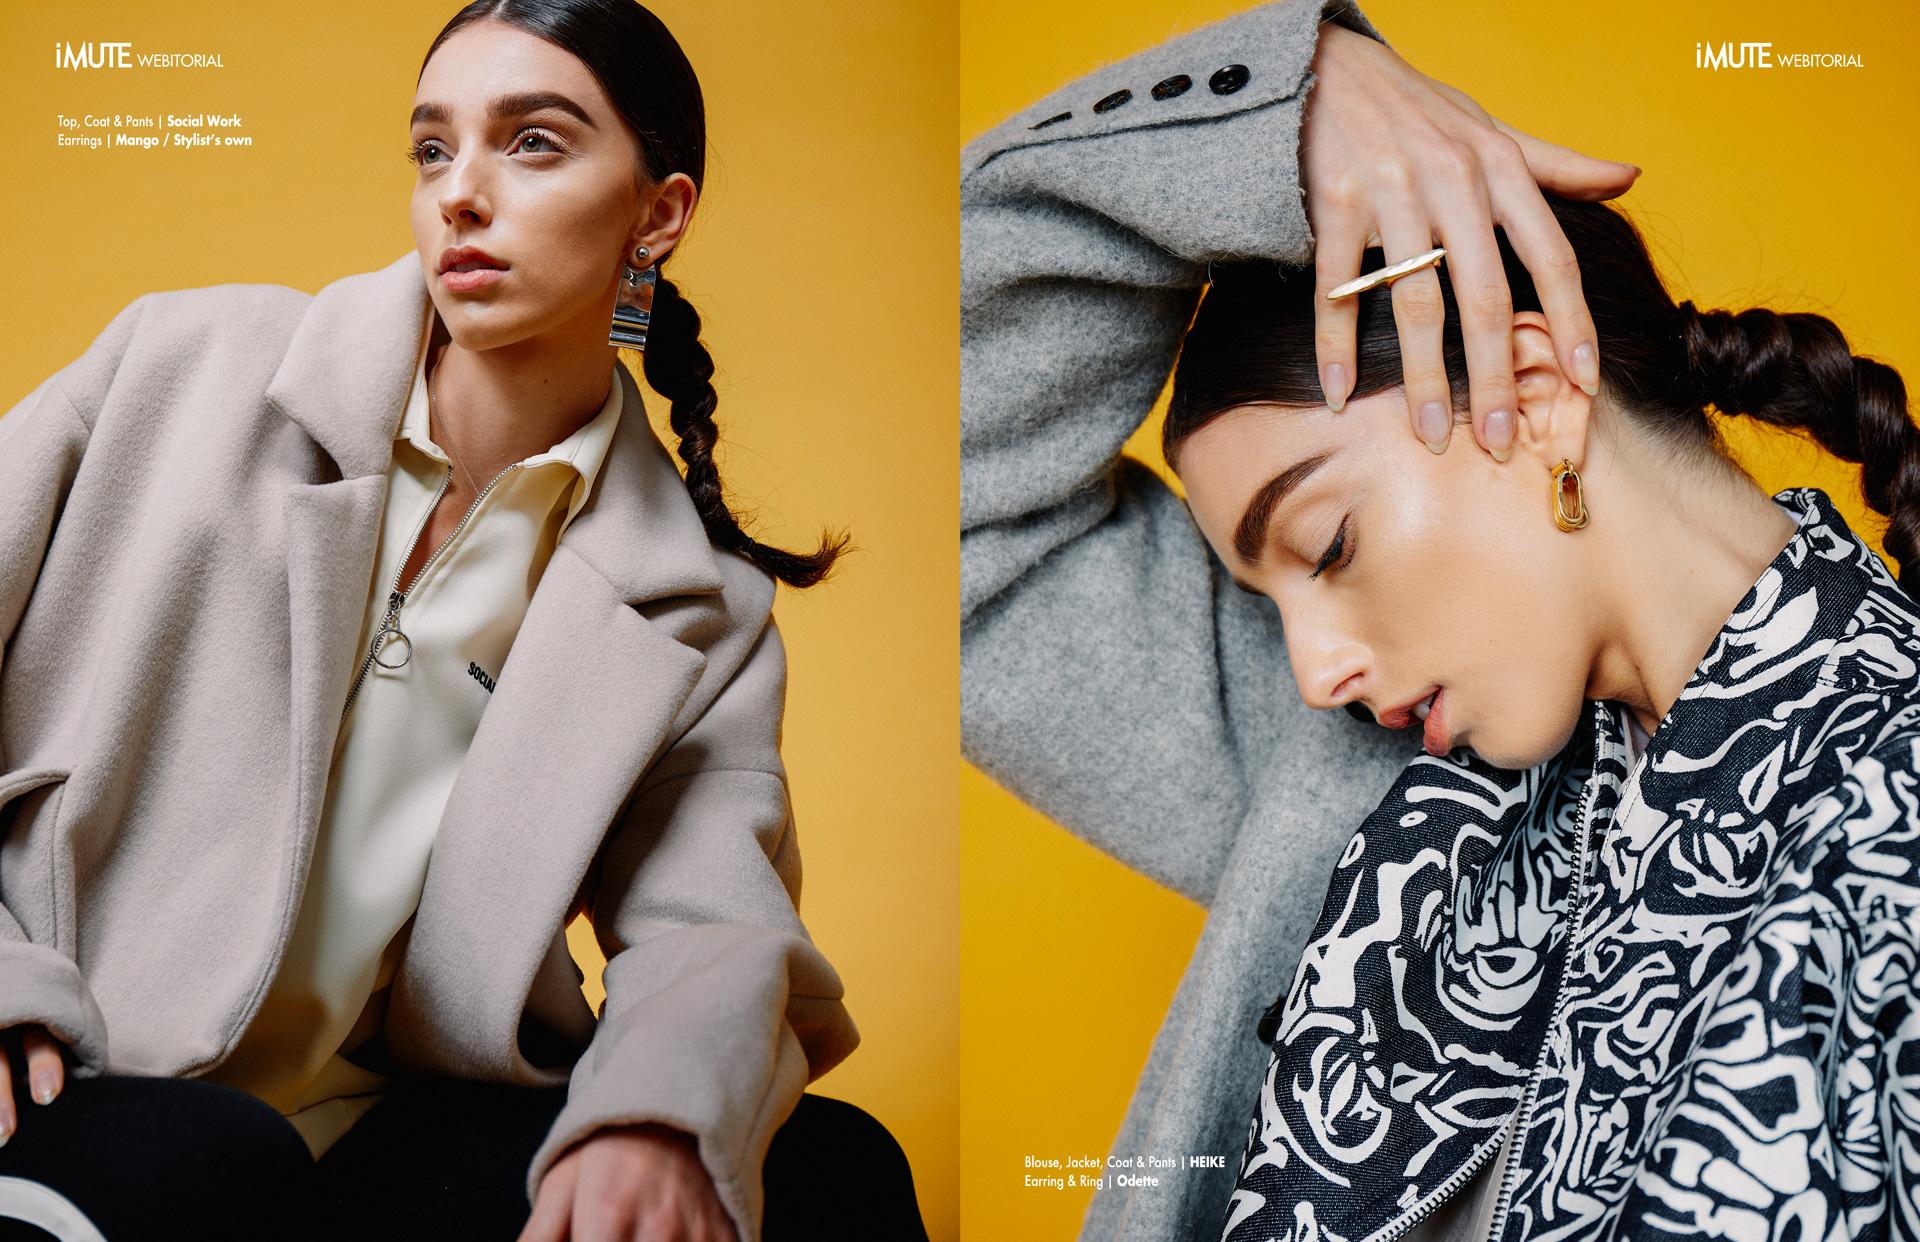 Burnt Orange webitorial for iMute Magazine Photographer|Ashley Jo Wilson Model| Larissa Marchiori @Industry Model Management Stylist|Lauren Walsh Makeup|Tatiana Avila Hair| Tierra Lee